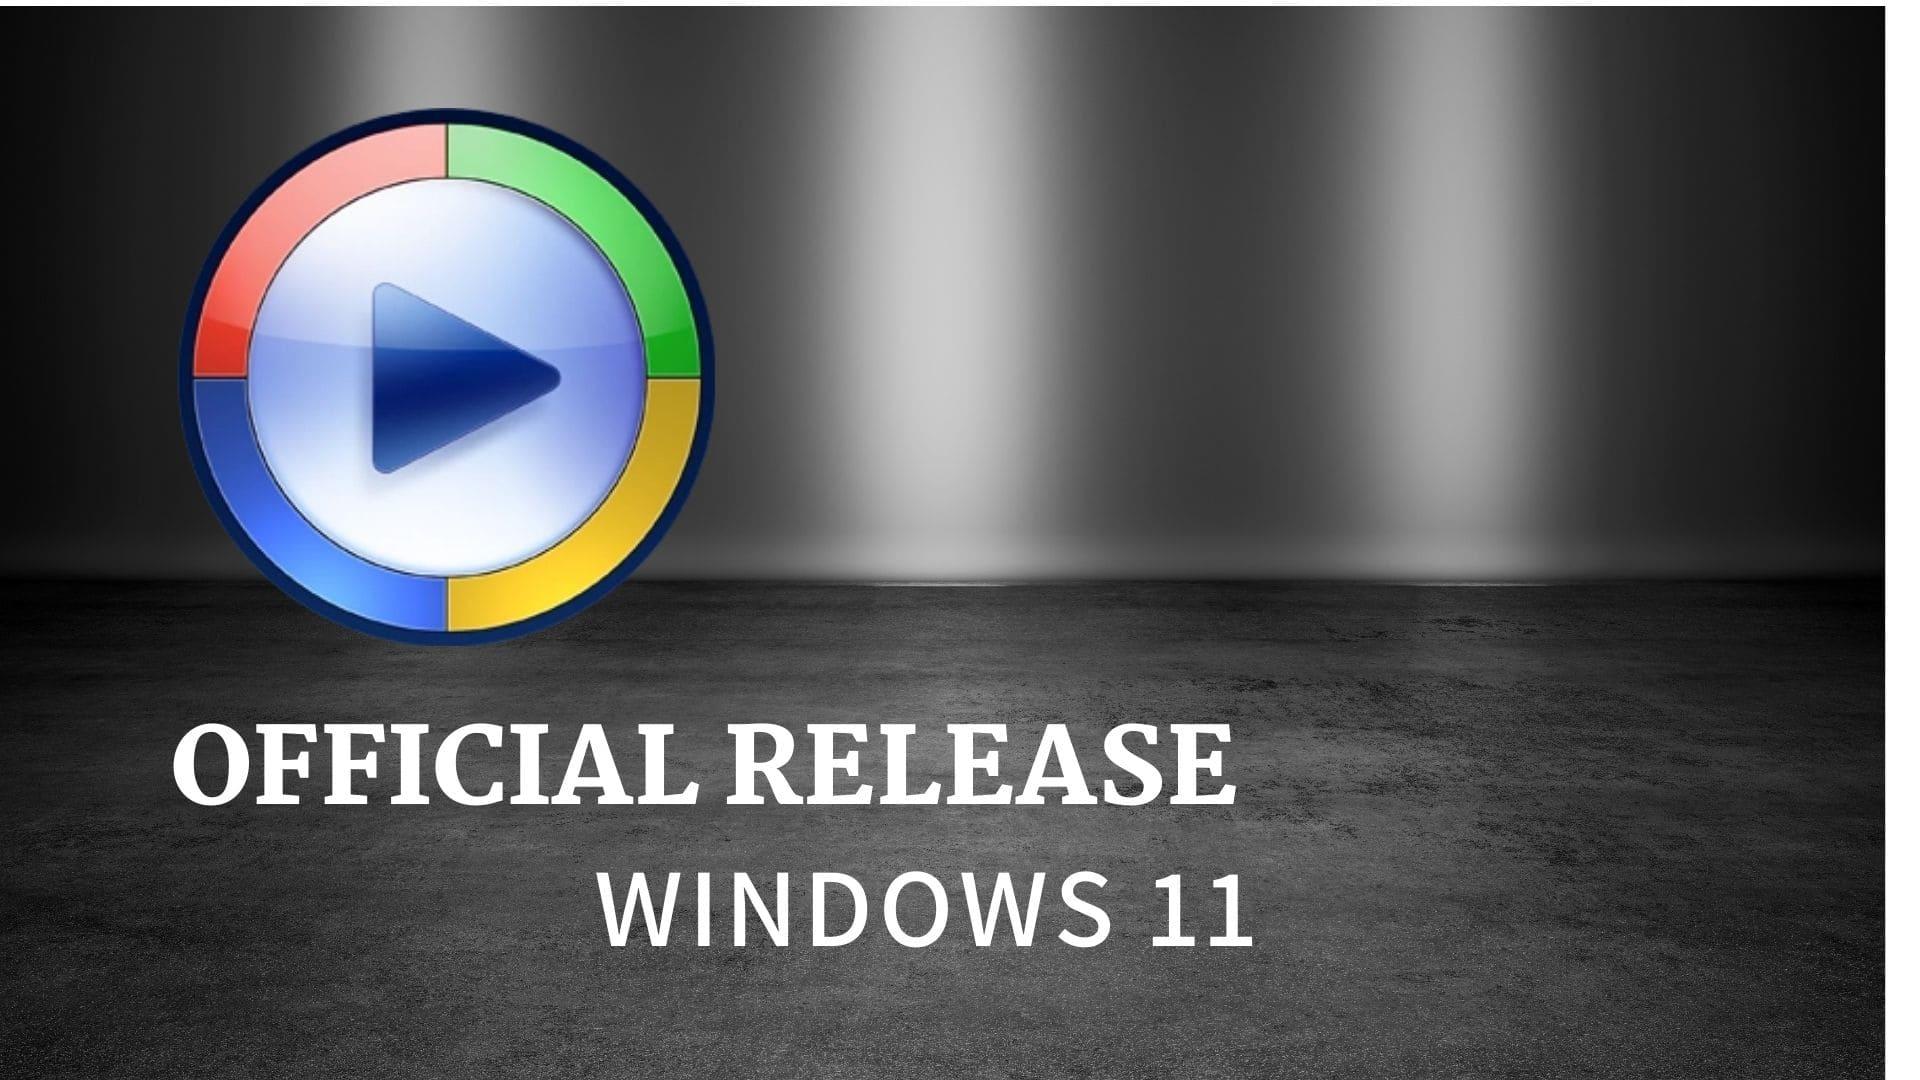 microsoft window 11 dowload